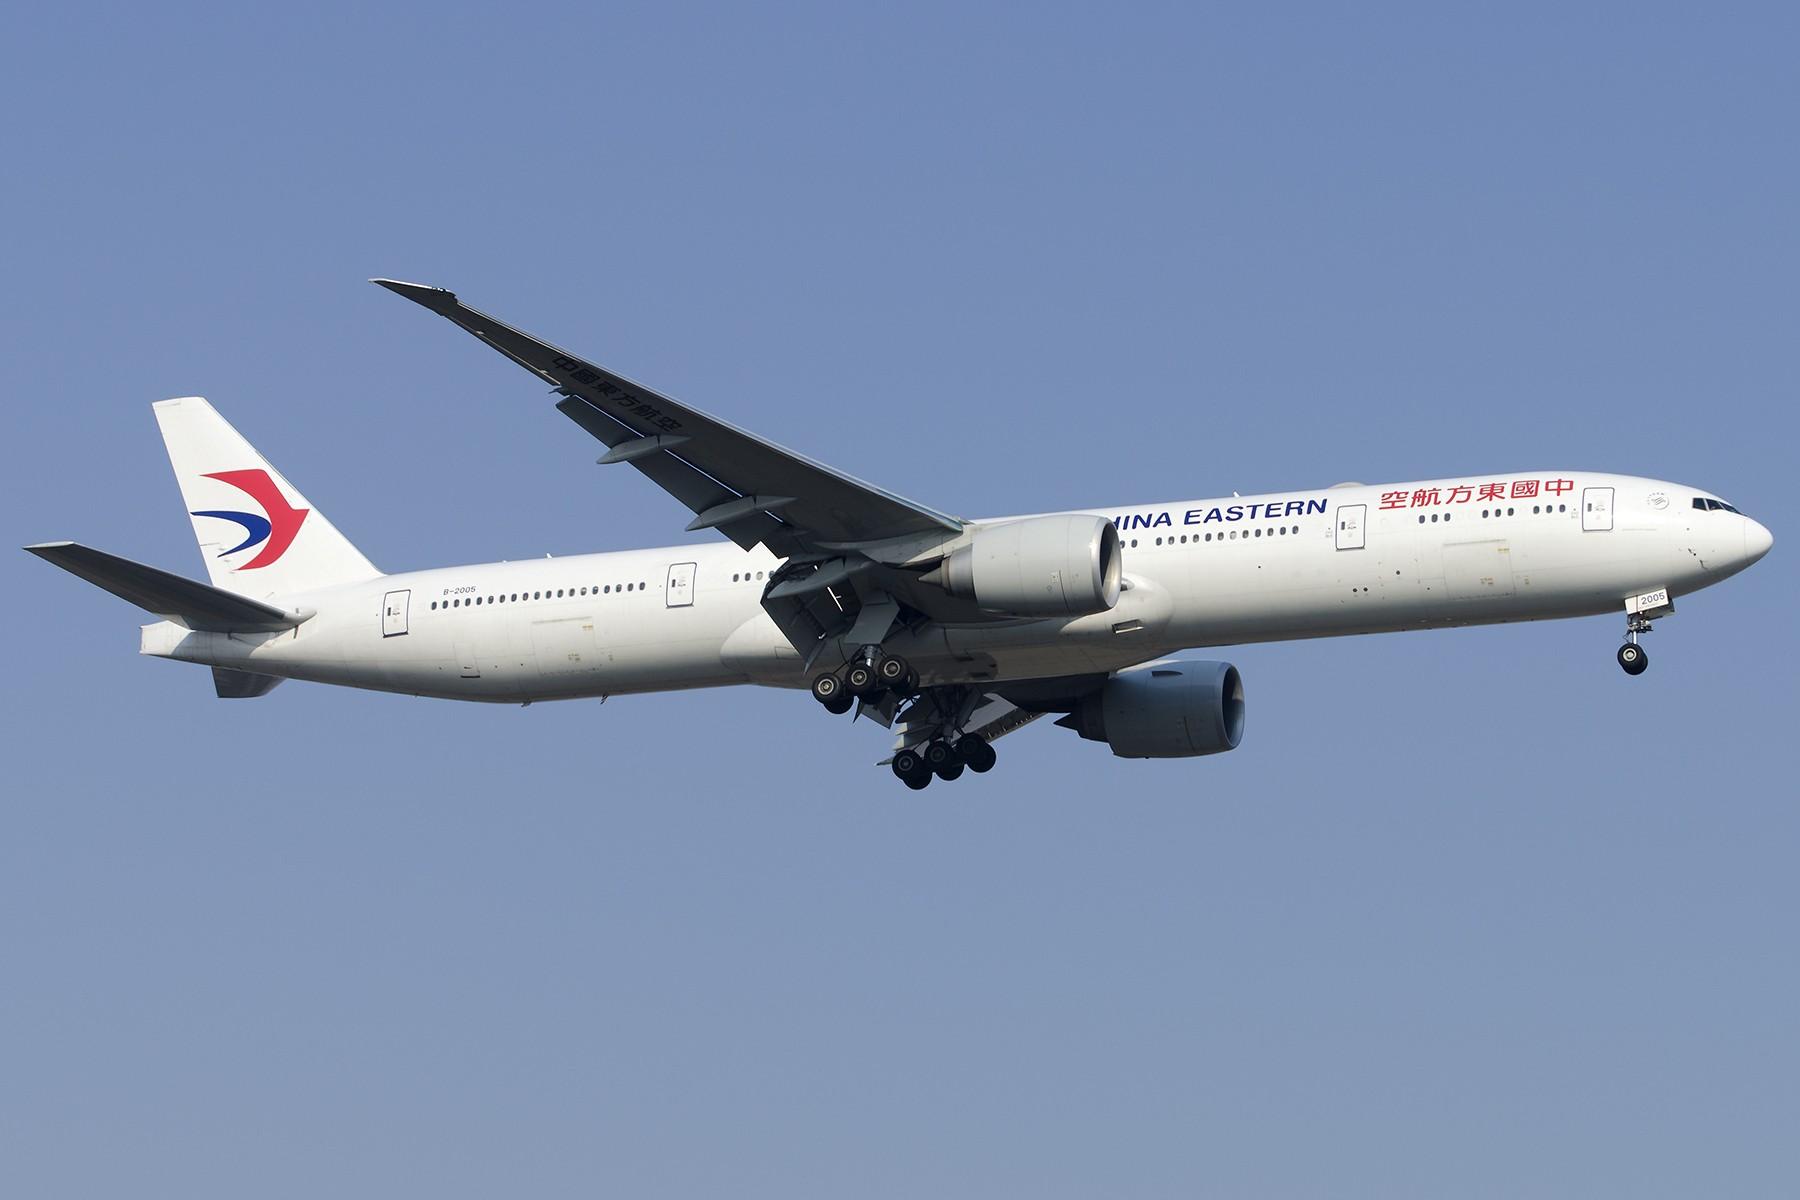 Re:[原创][原创]【PVG】好久没发图了,一堆库存(2)午后 BOEING 777-300ER B-2005 中国上海浦东国际机场